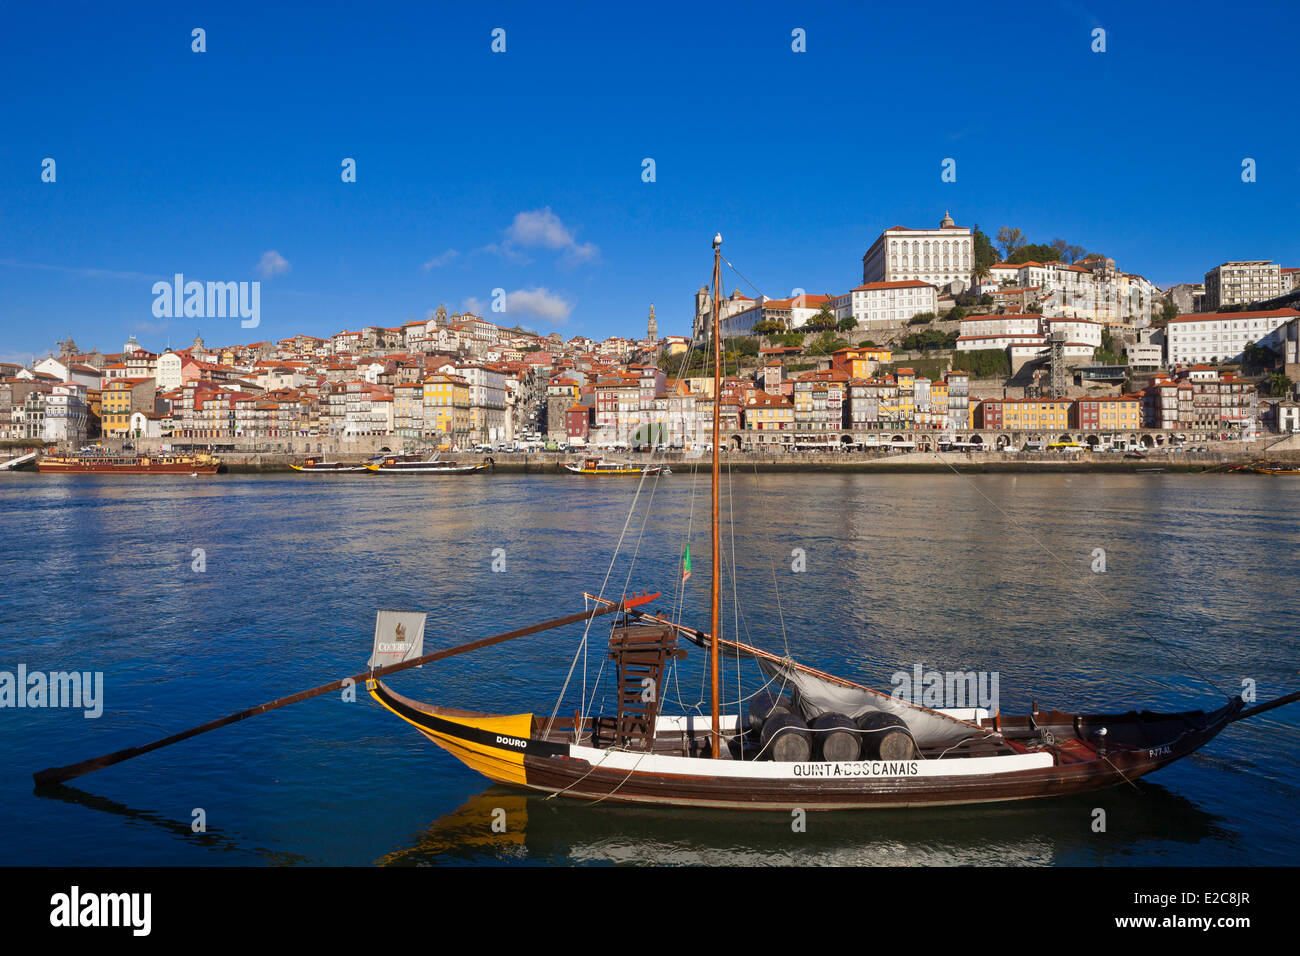 Portugal, Norte Region, Porto, historical center listed as World Heritage by UNESCO, the historic Cais de Ribeira Stock Photo